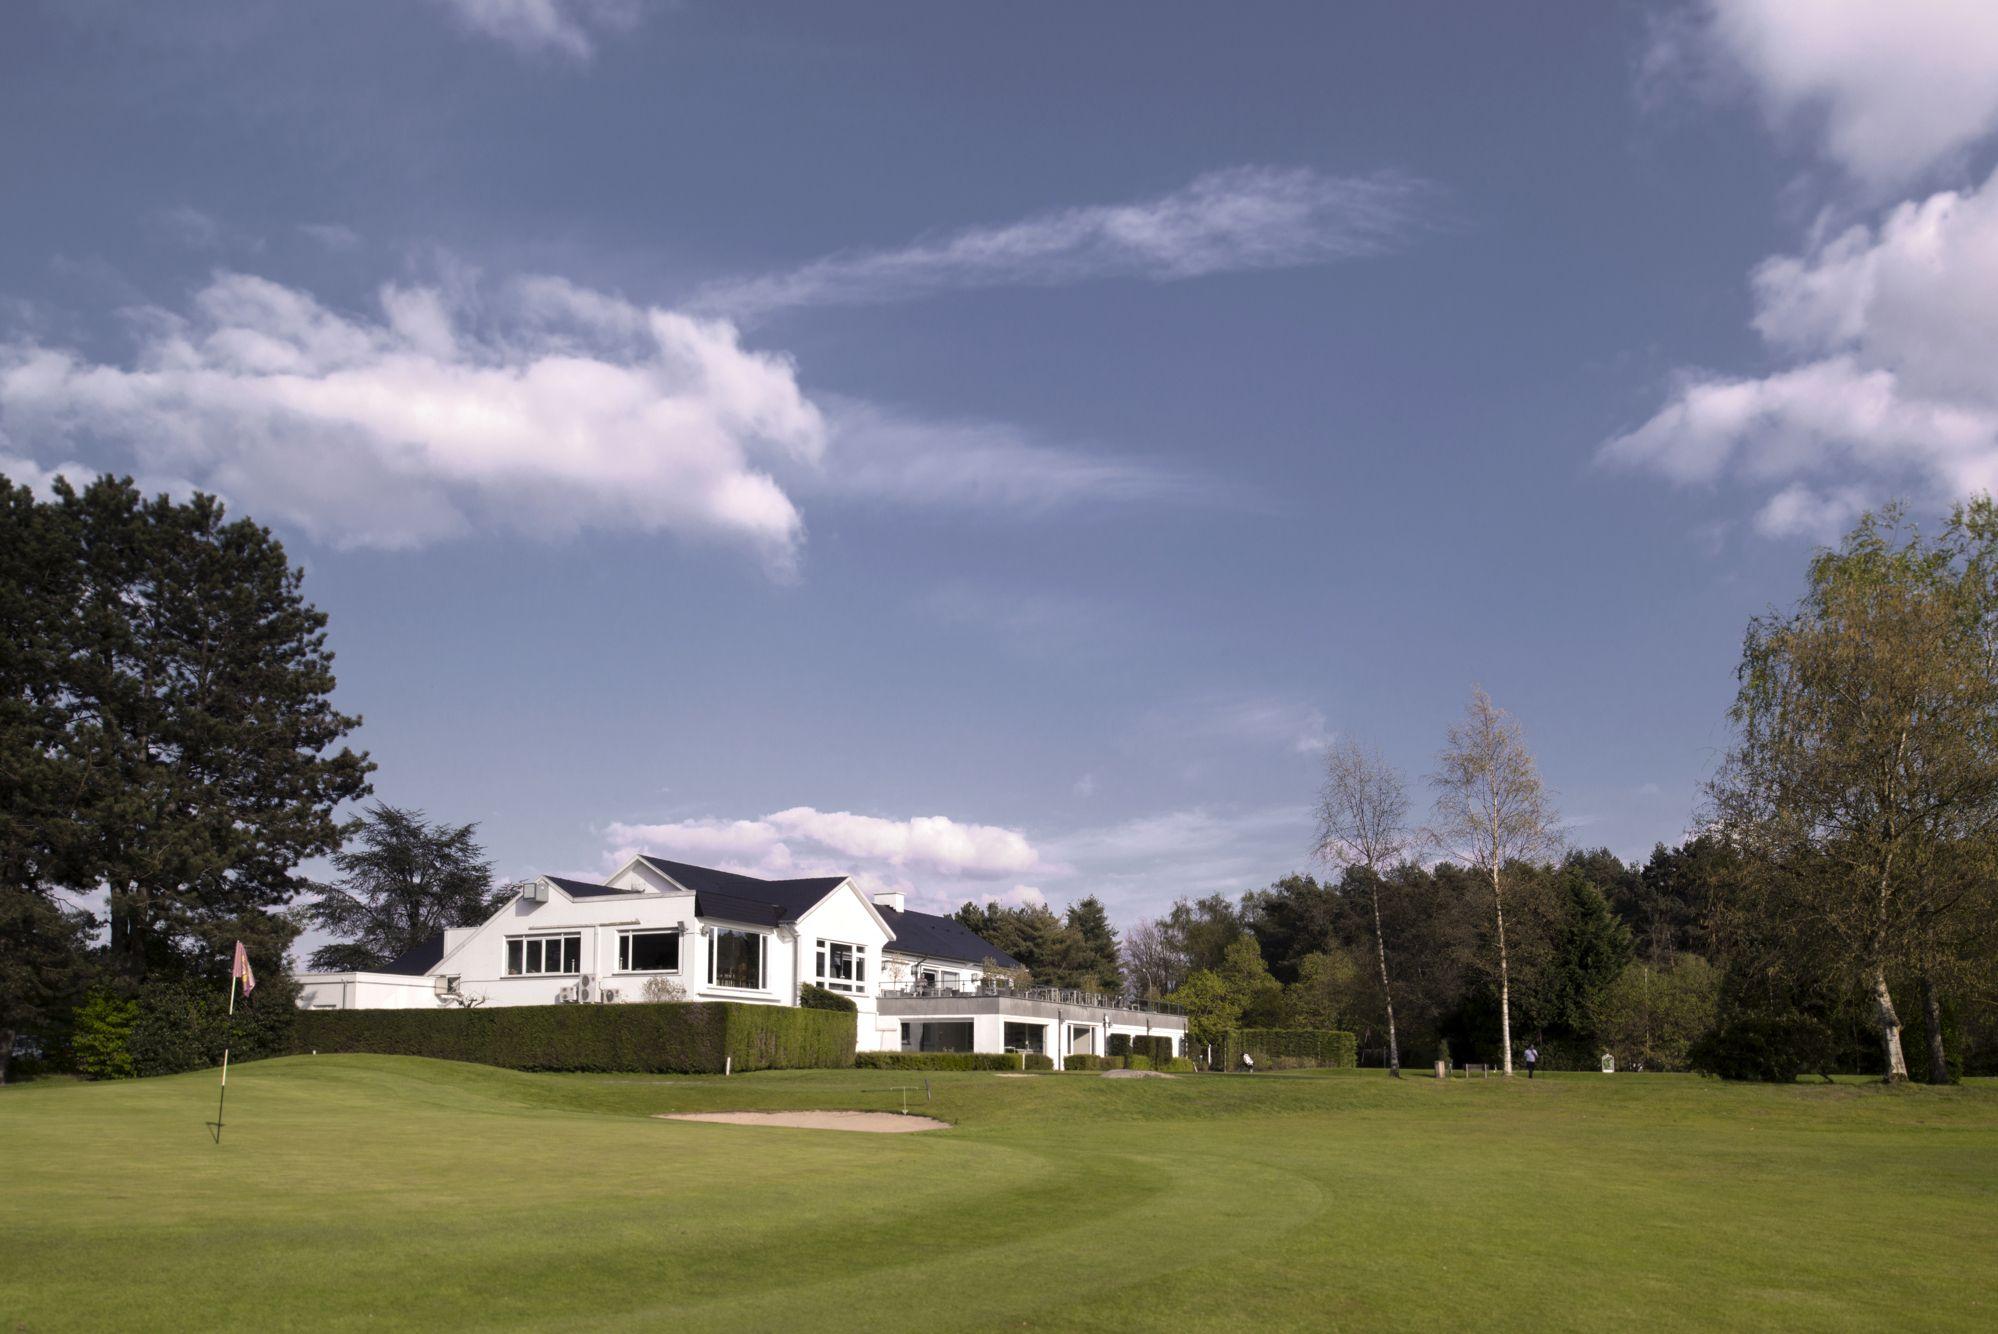 Keerbergen Golf Club